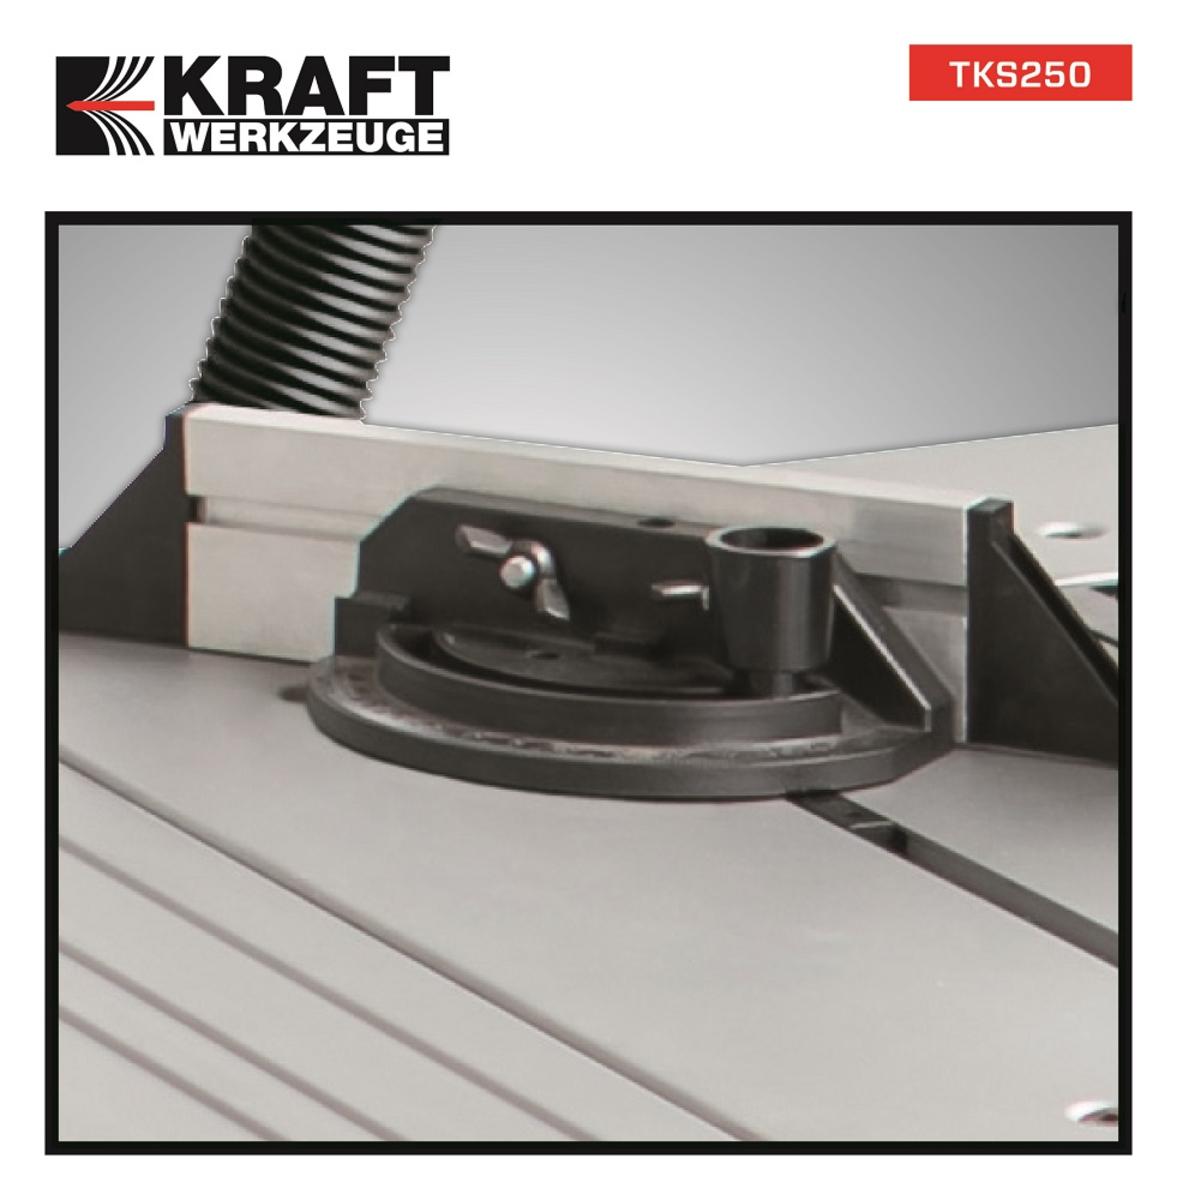 Bild 4 von Kraft Werkzeuge Tischkreissäge TKS250 inkl. 2. Sägeblatt